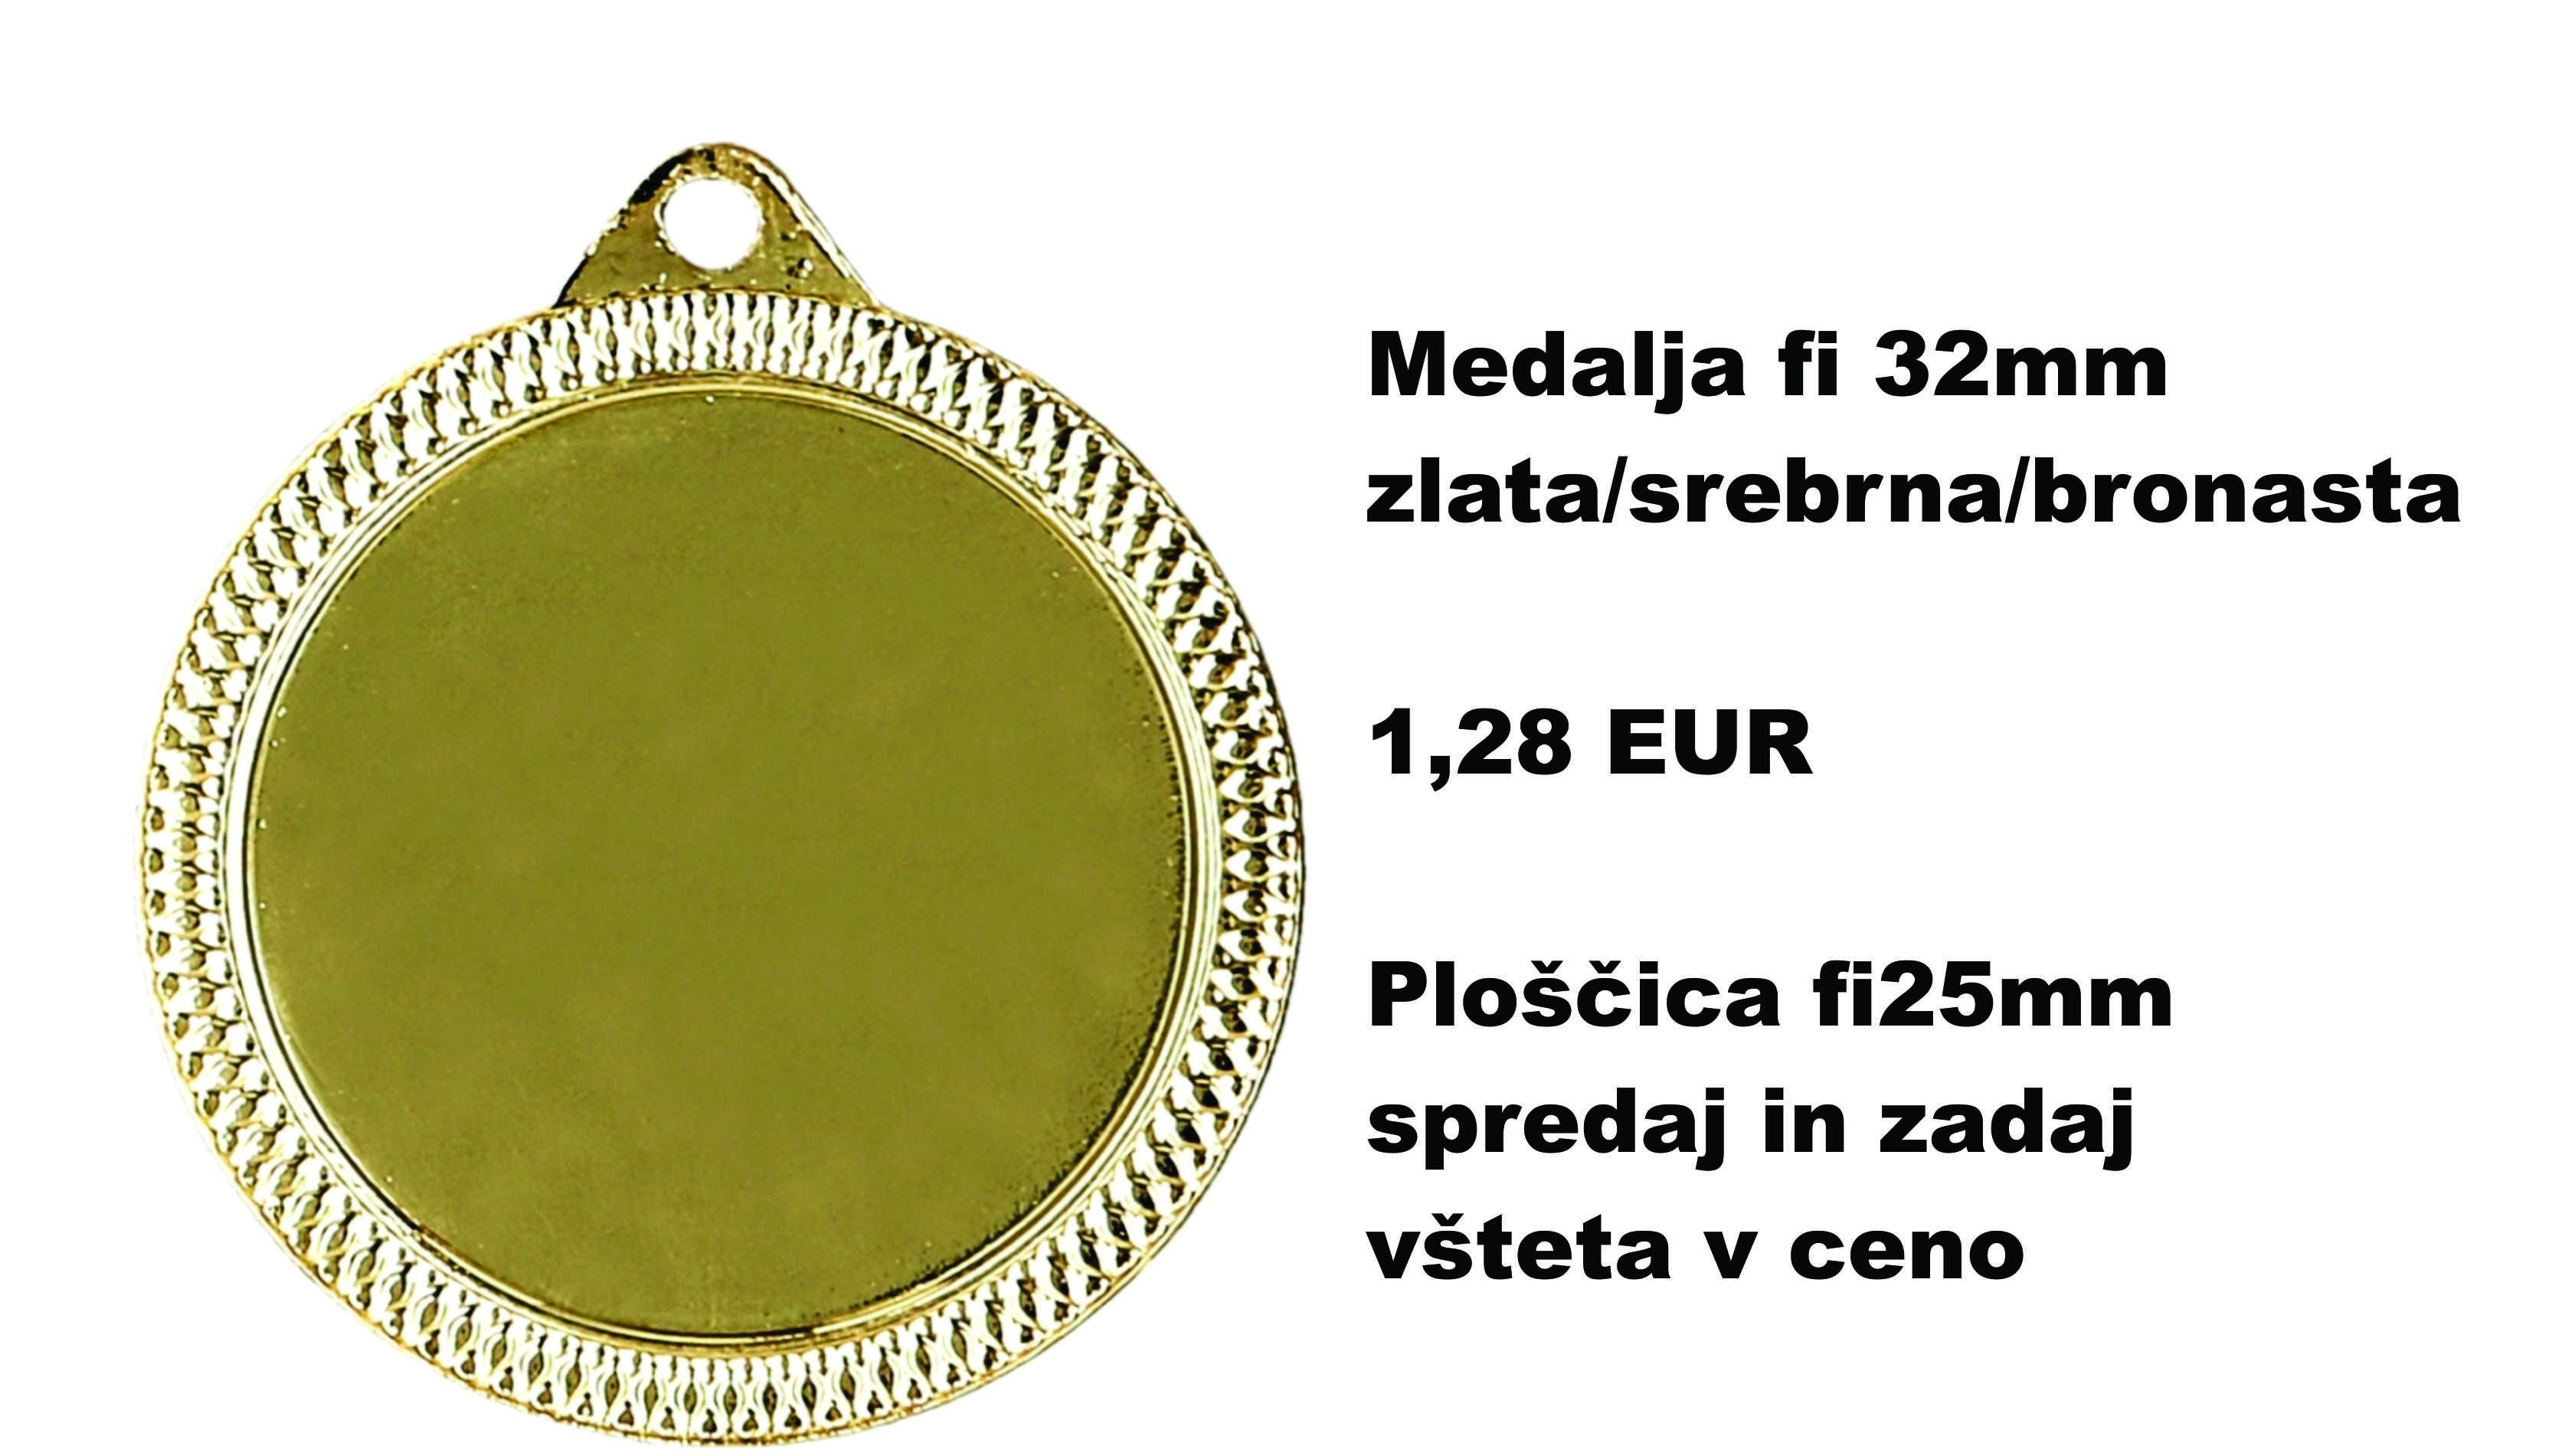 medalja32